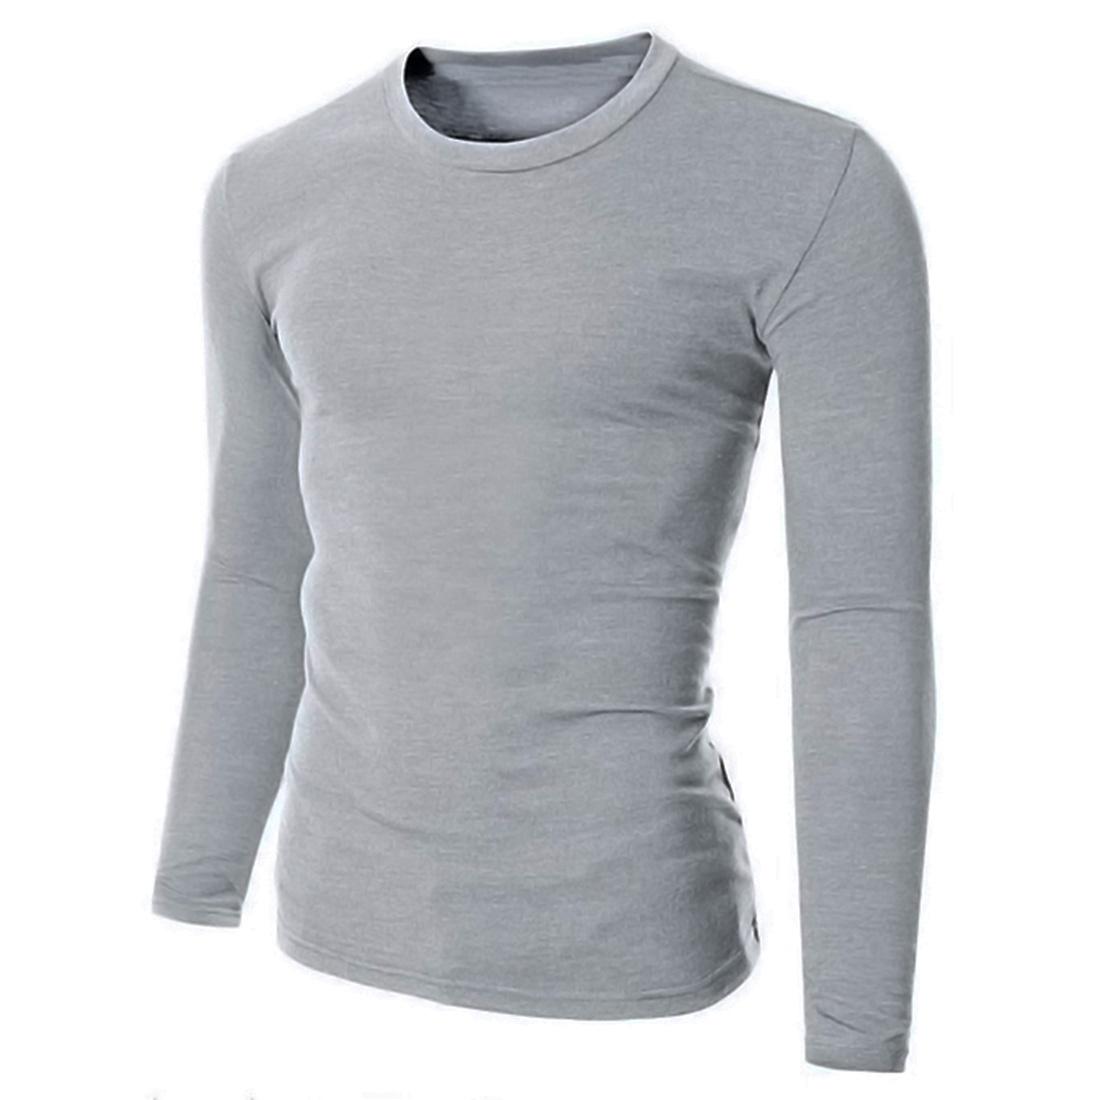 100 cotton mens slim basic tee t shirt long sleeve v neck for Long sleeve cotton tee shirts